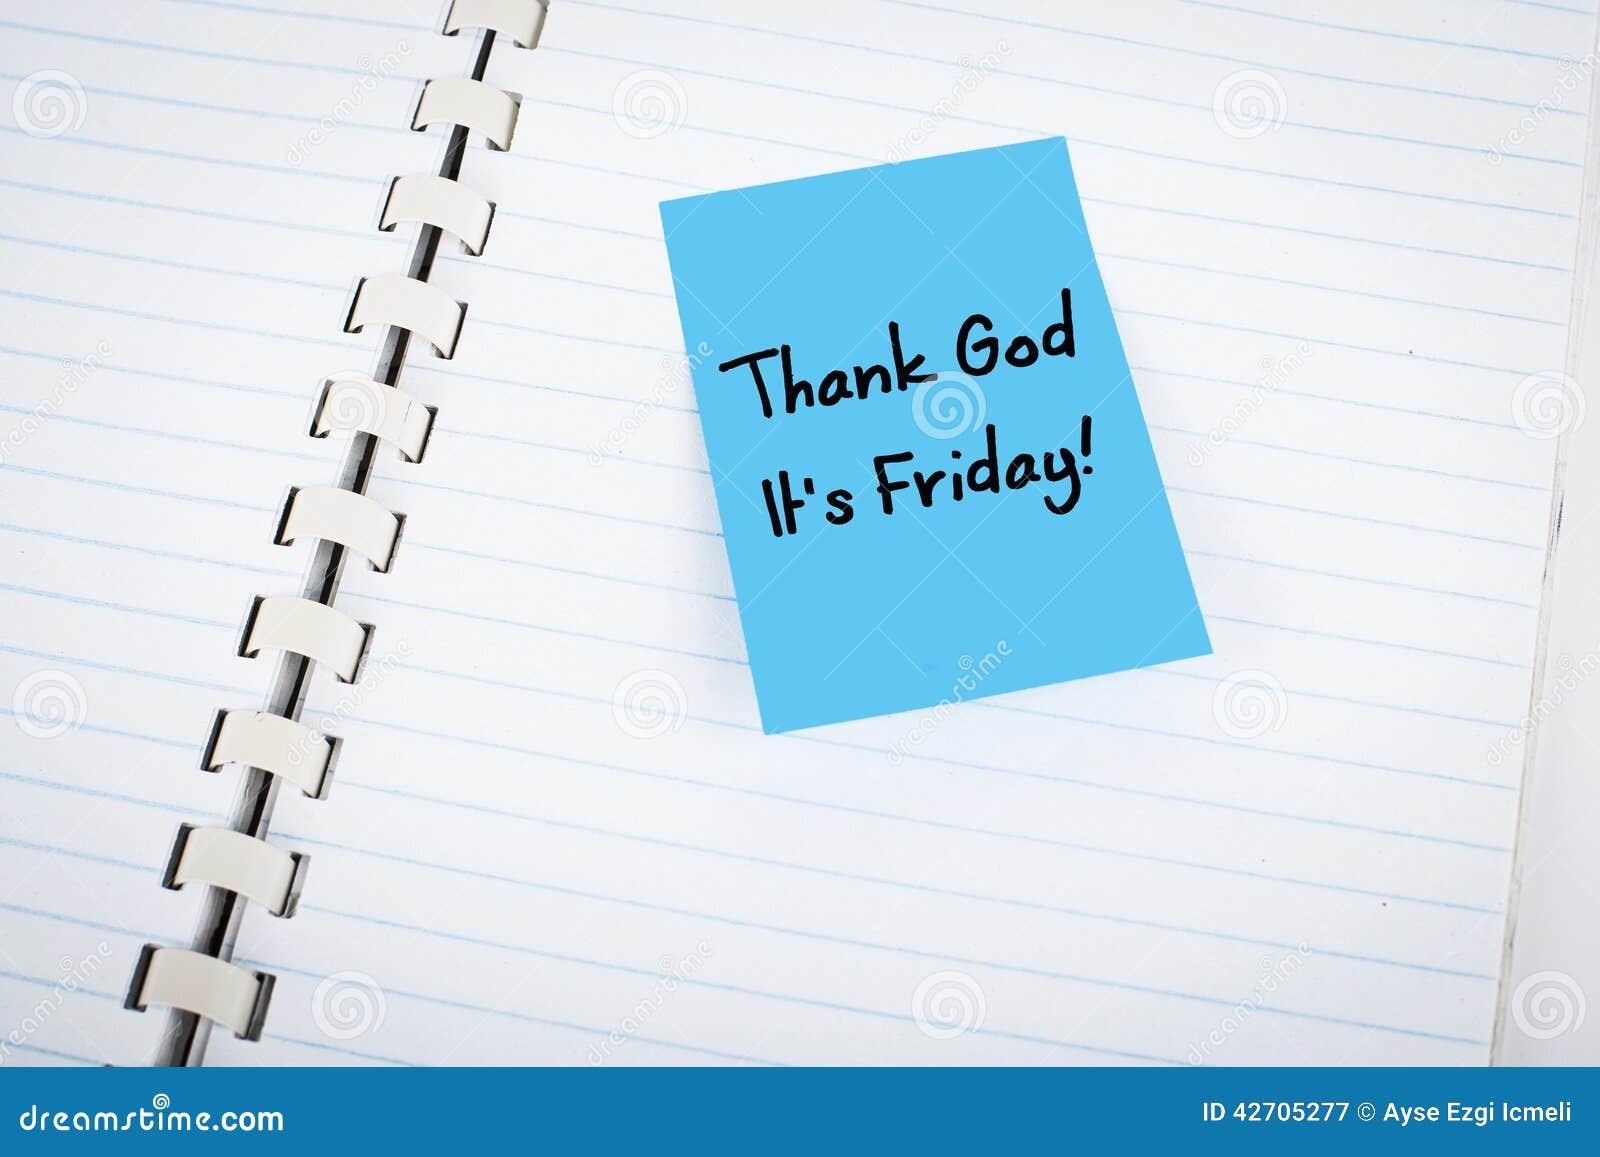 Возблагодарите бога пятница